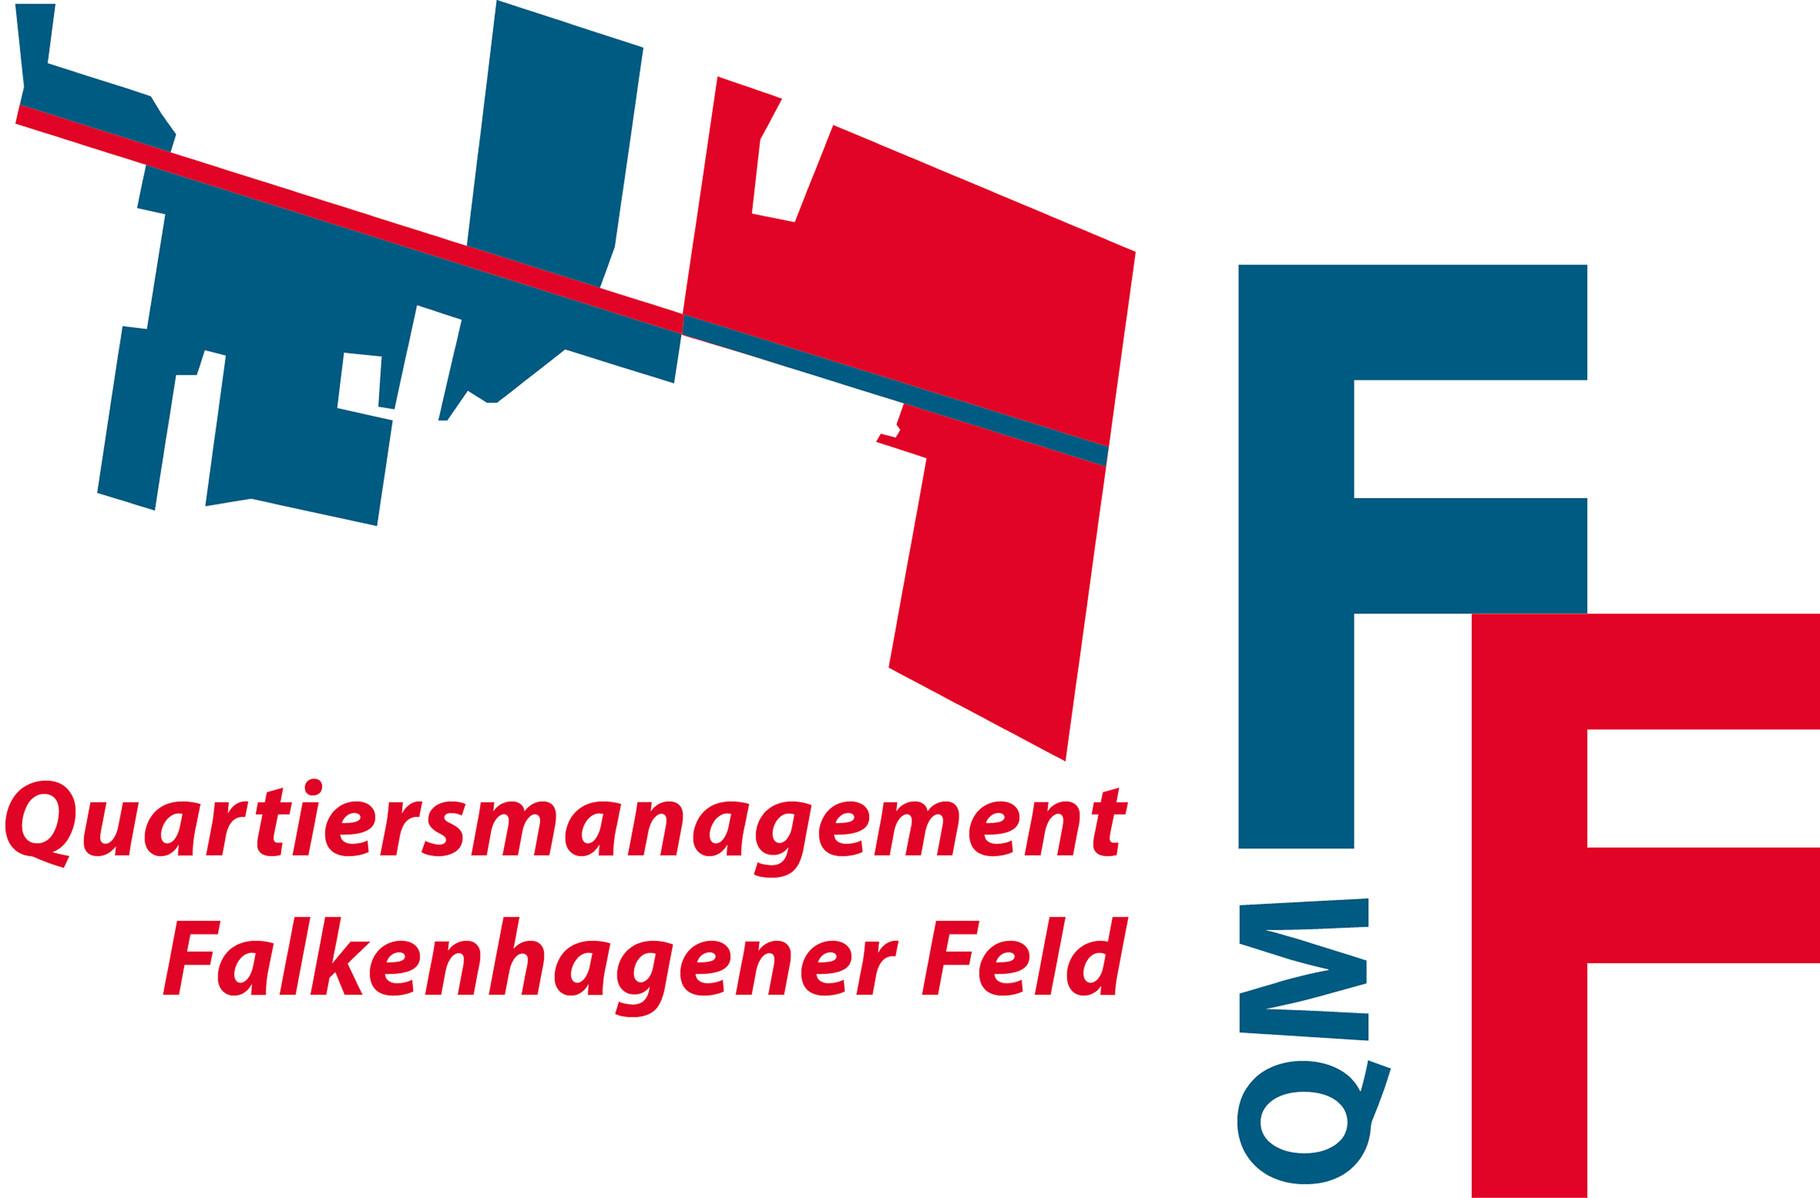 Quartiersmanagement Falkenhagener Feld